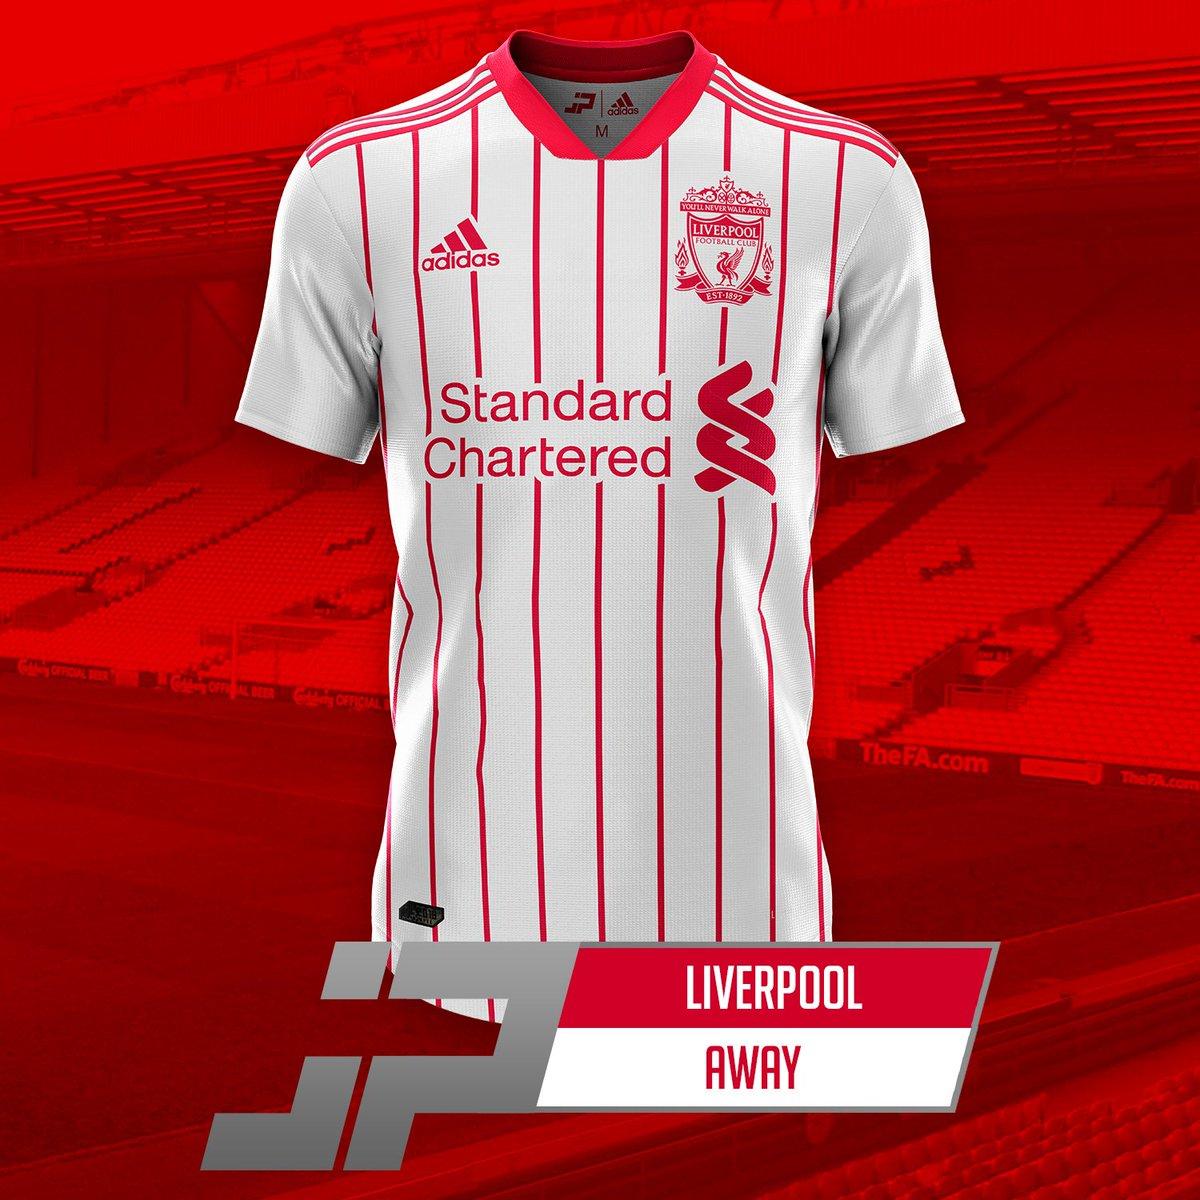 online store cf0f5 b2507 Liverpool Away Concept Kit. Rate 1-10! 😊 #JPereira ...